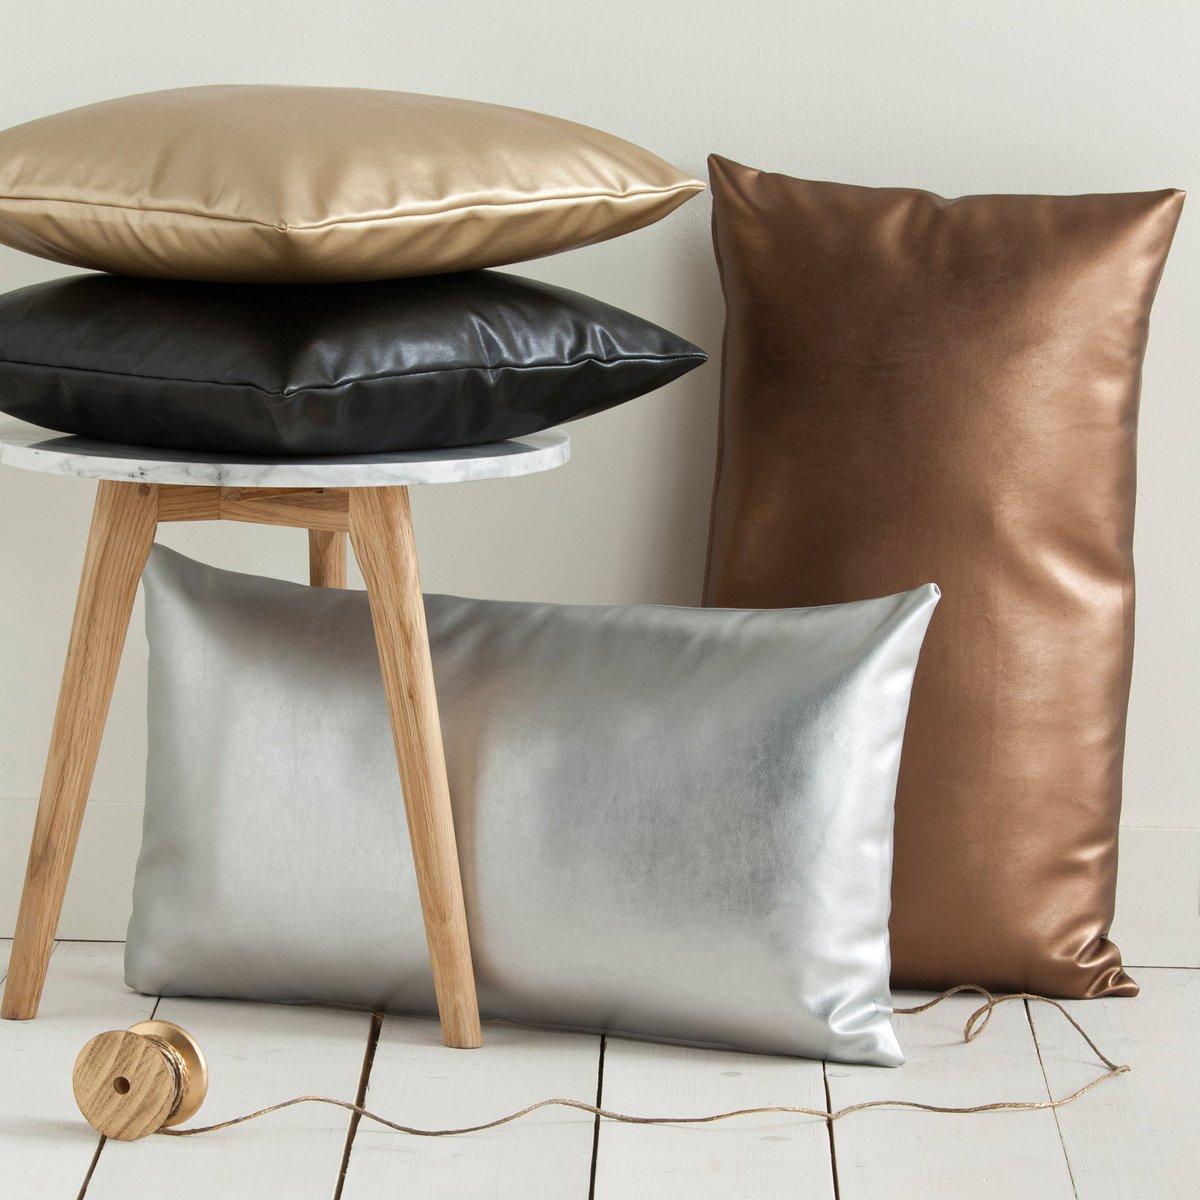 3suisses 3suisses twitter. Black Bedroom Furniture Sets. Home Design Ideas